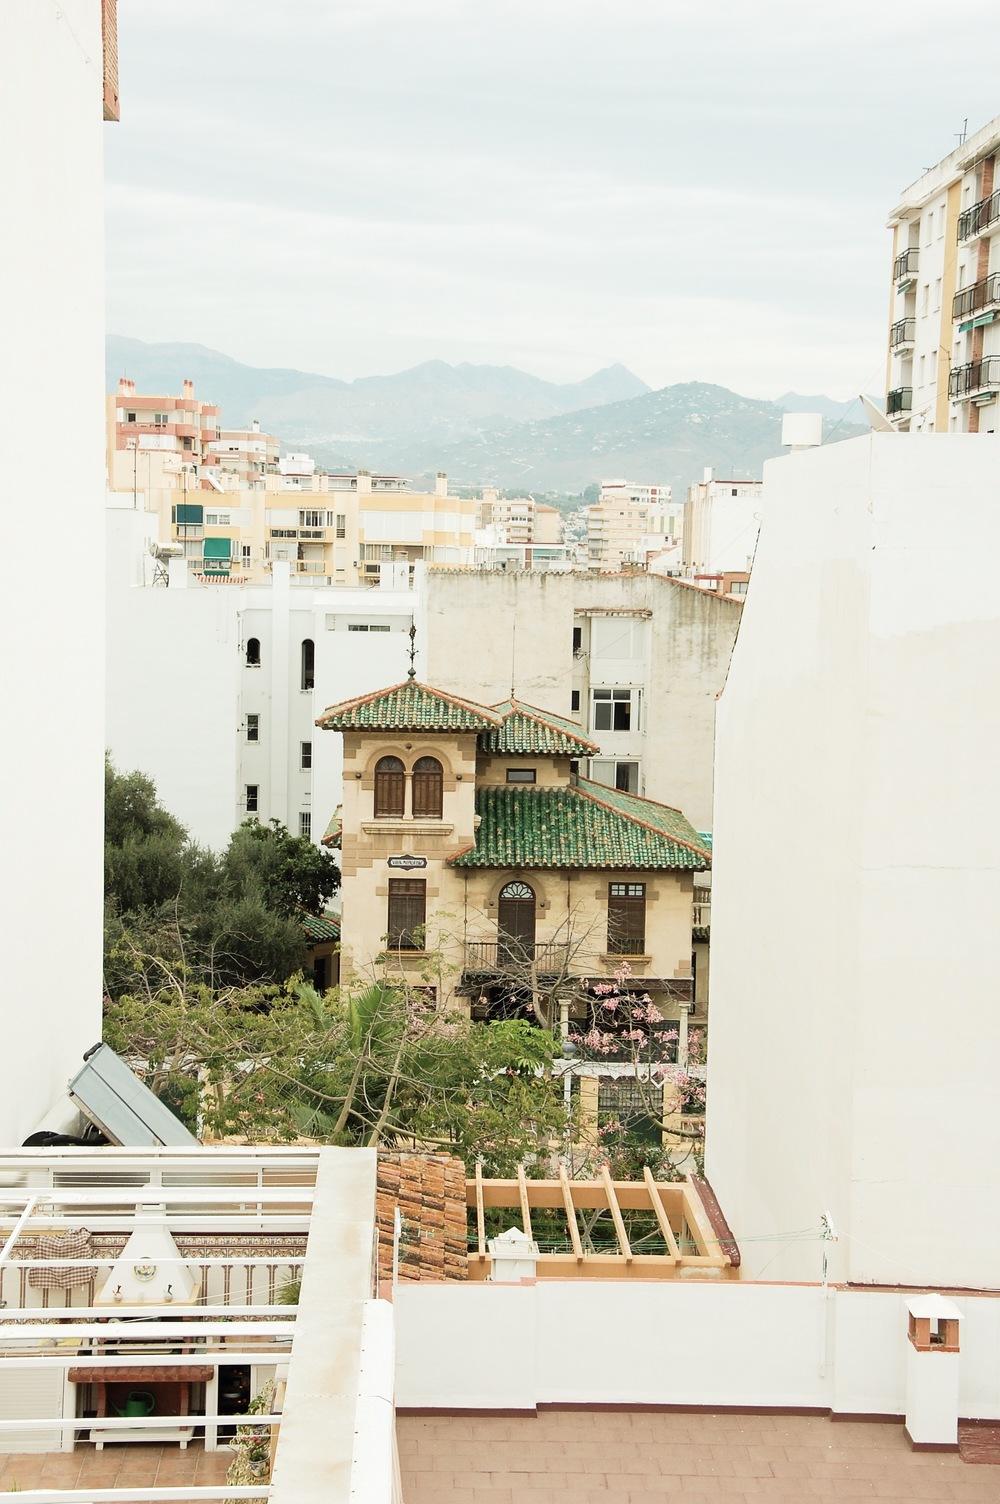 malaga-andalucia-spain-a-little-homesick-3.JPG